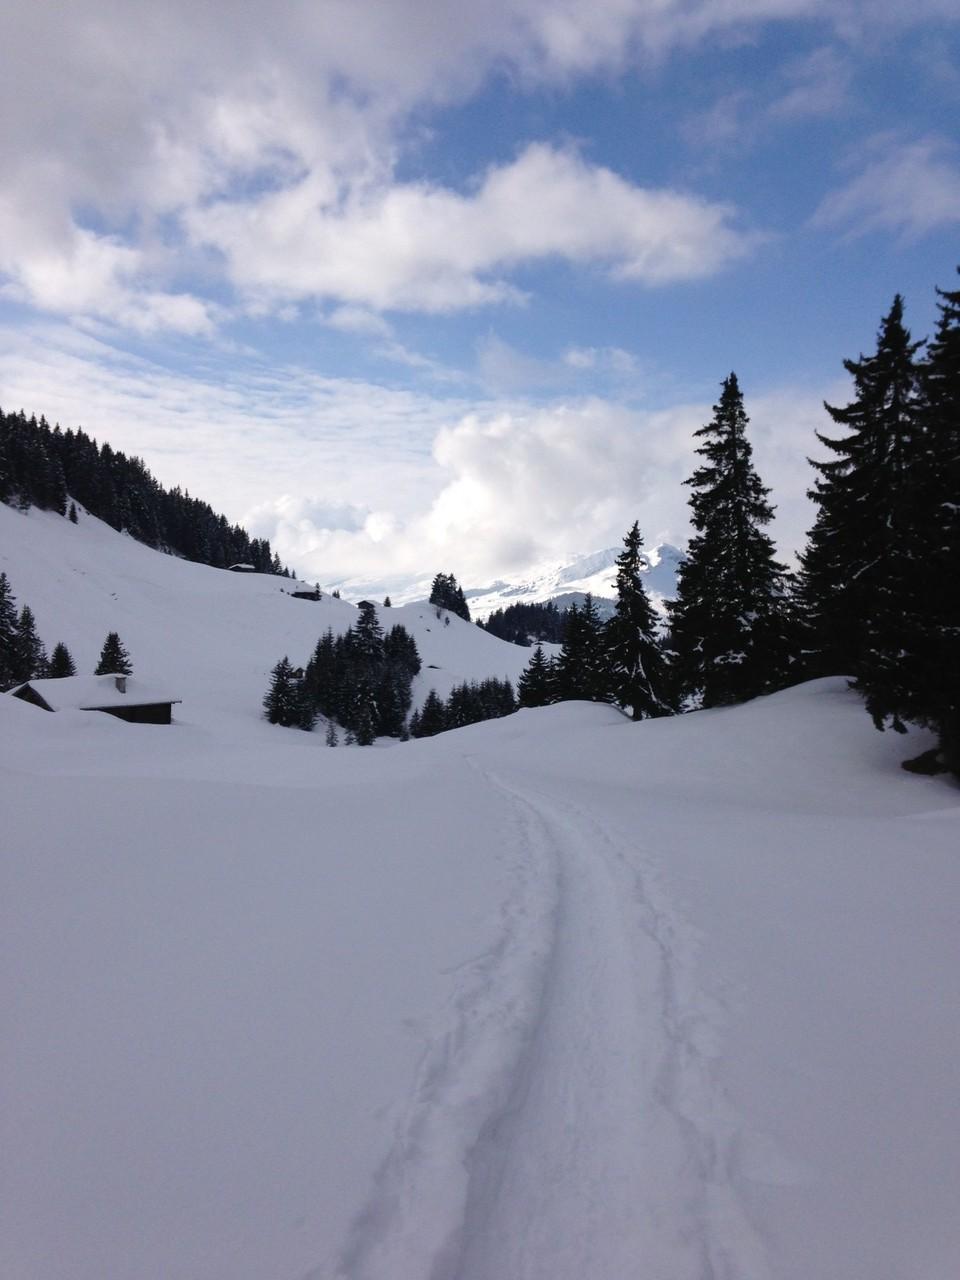 Dutjer Alp GR 2032m ü. M. (17. Februar 2013)